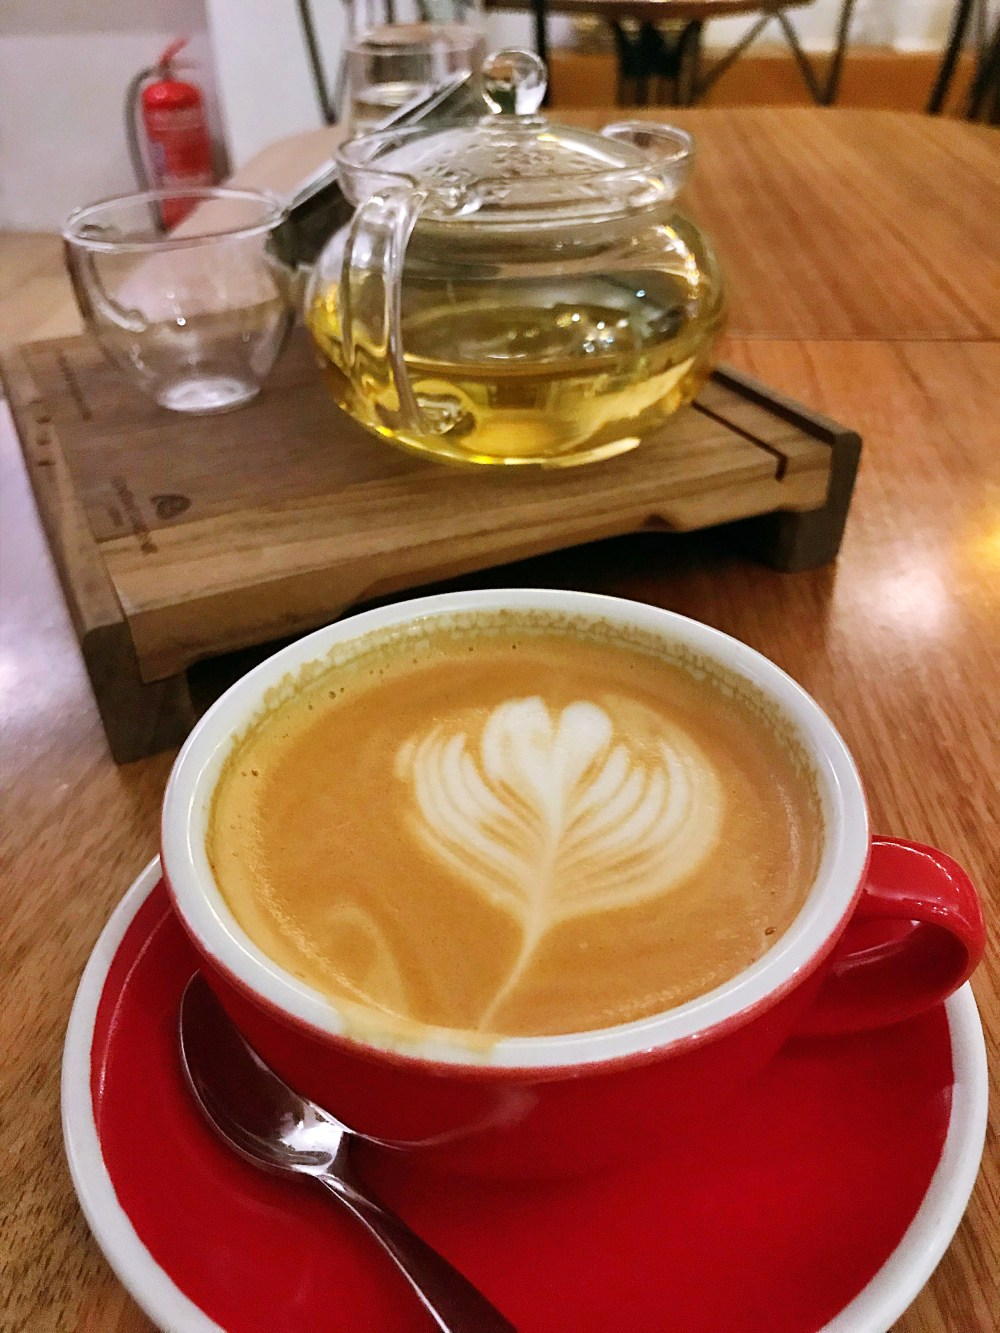 22 March 2020: Constant Gardener Coffee